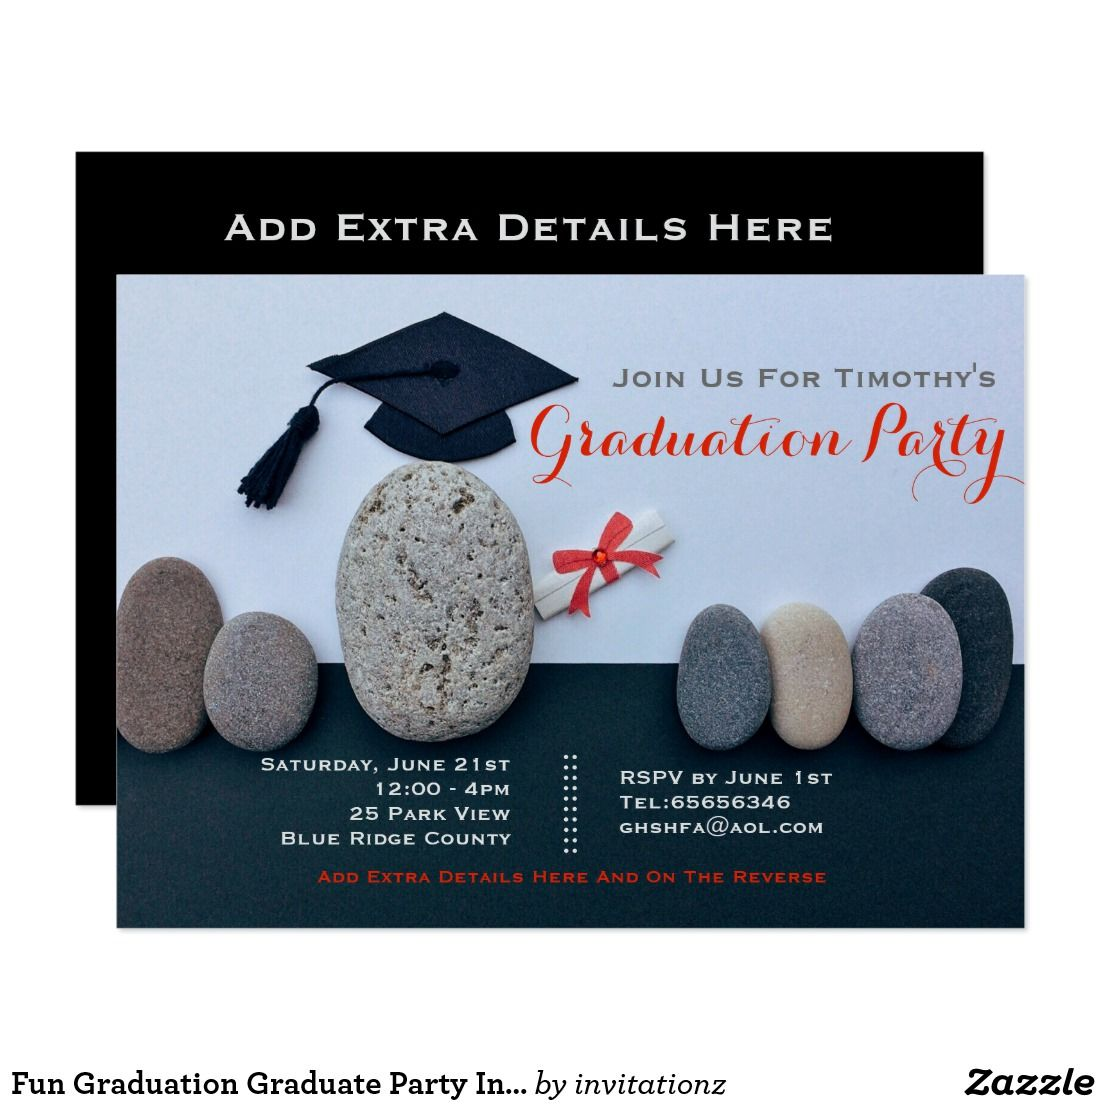 Fun Graduation Graduate Party Invitation